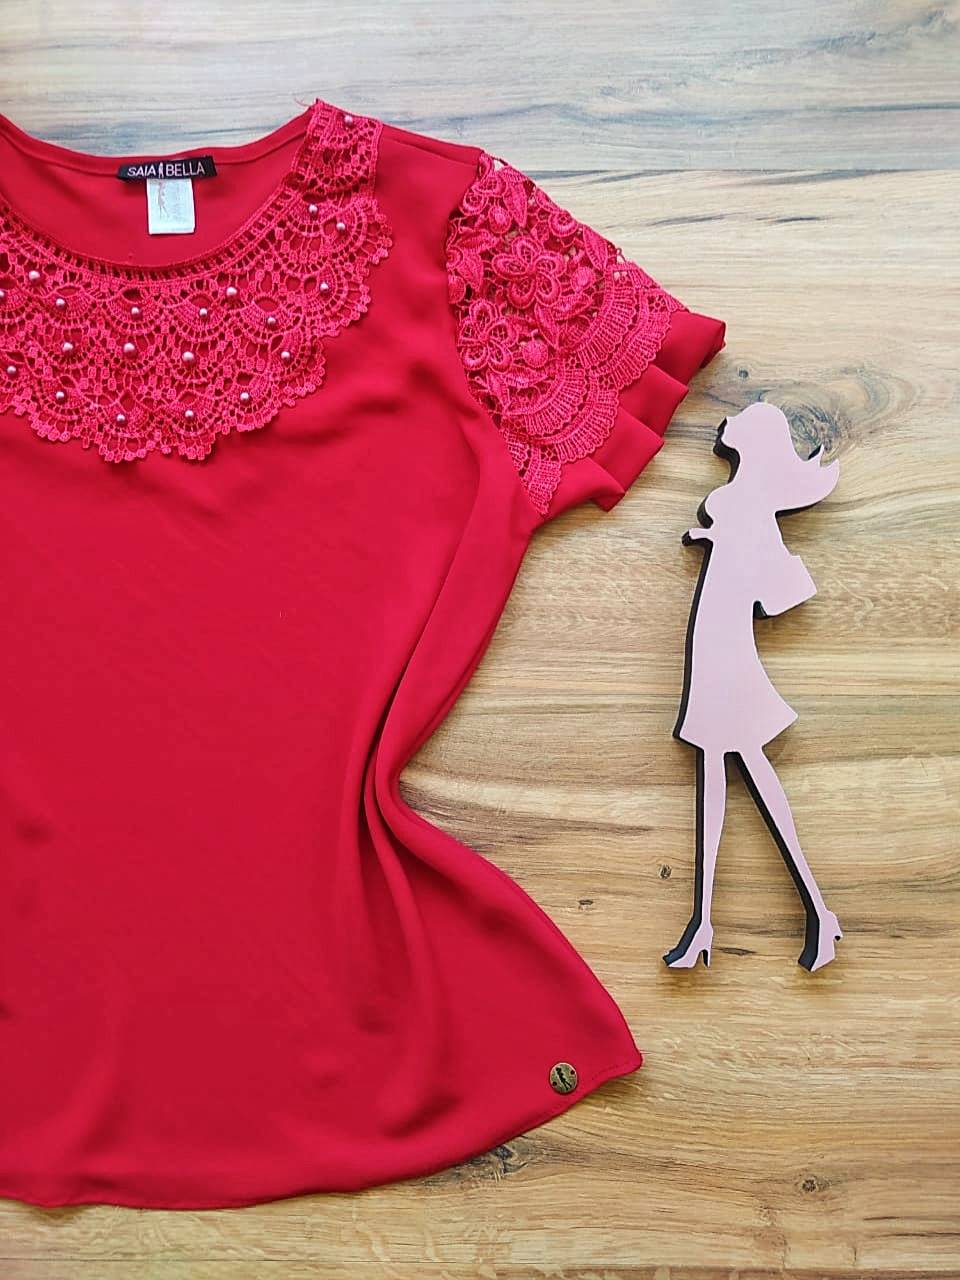 Blusa Estela de Renda Saia Bella - SB79904 Vermelho